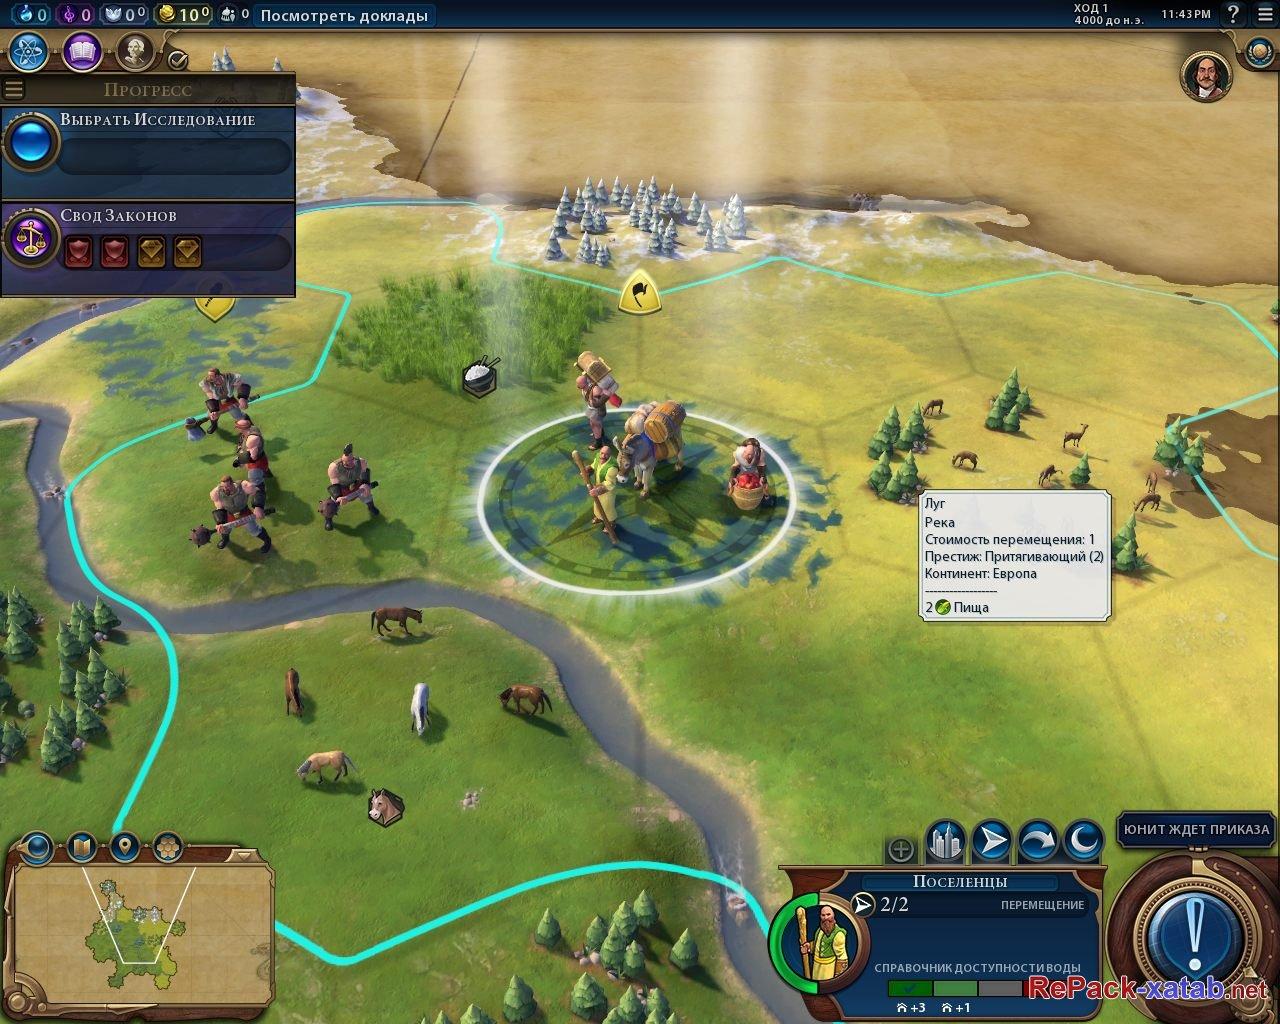 Civilization V Strategies - Persia - Darius I